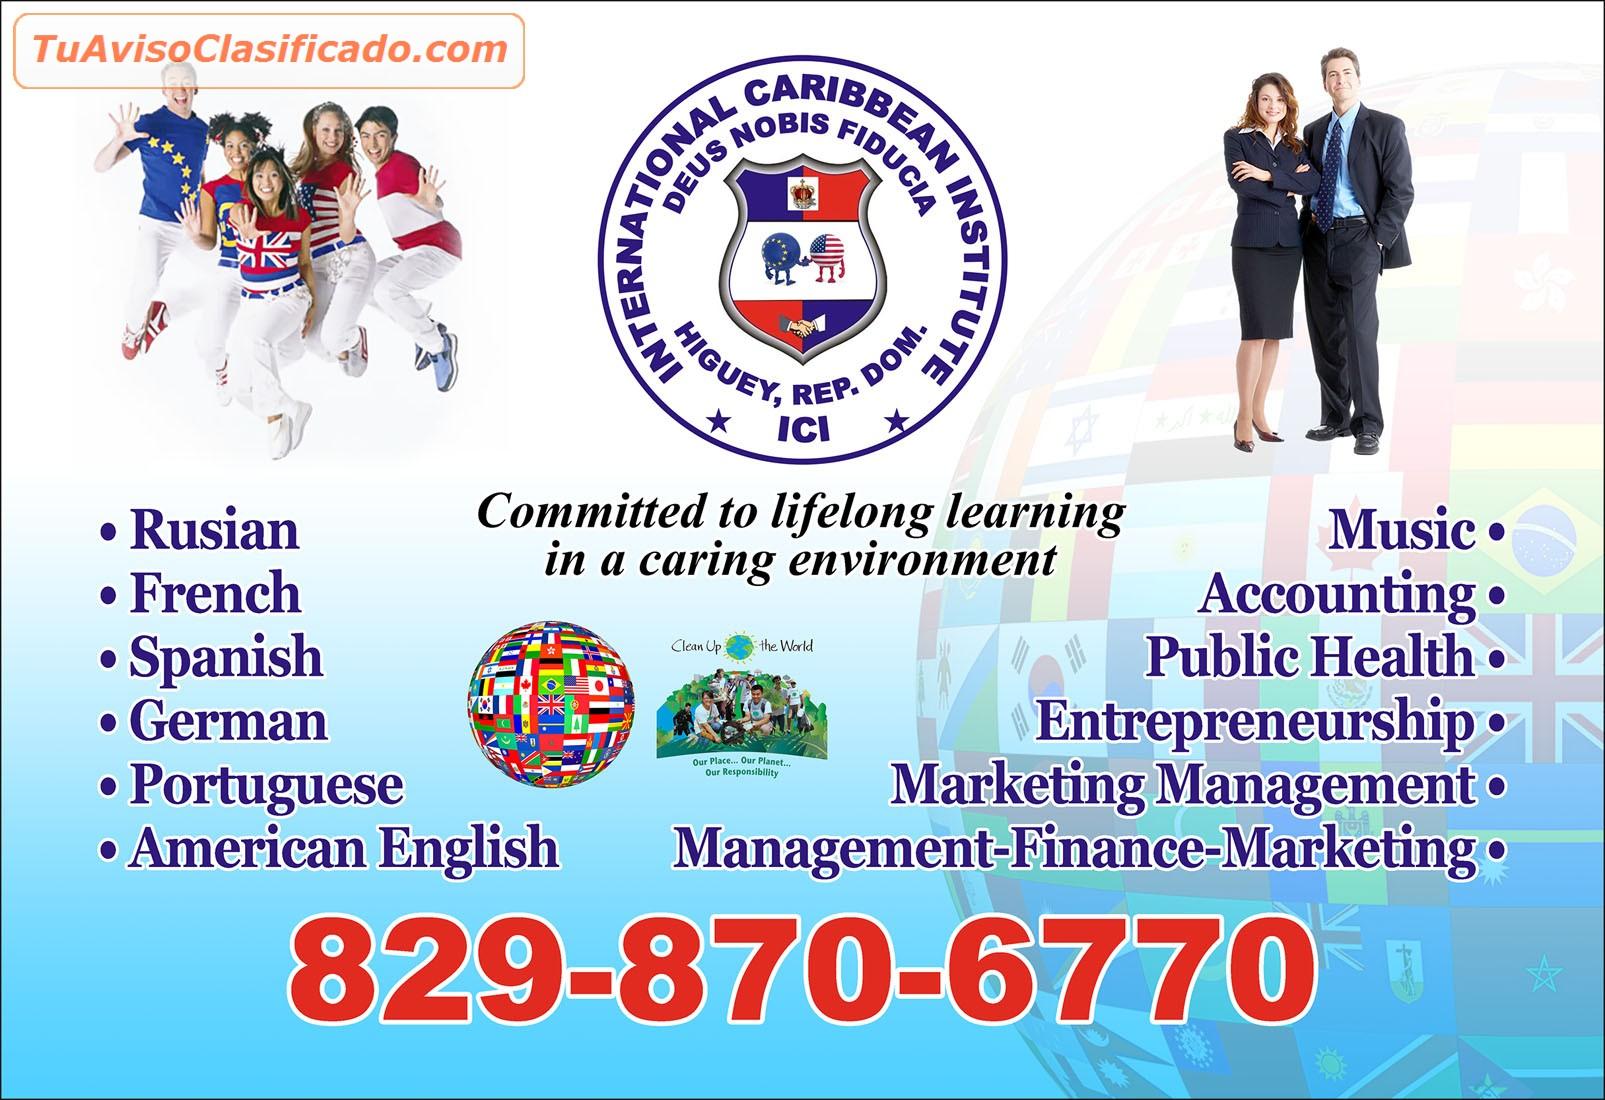 cursos-de-idiomas-6471-4.jpg